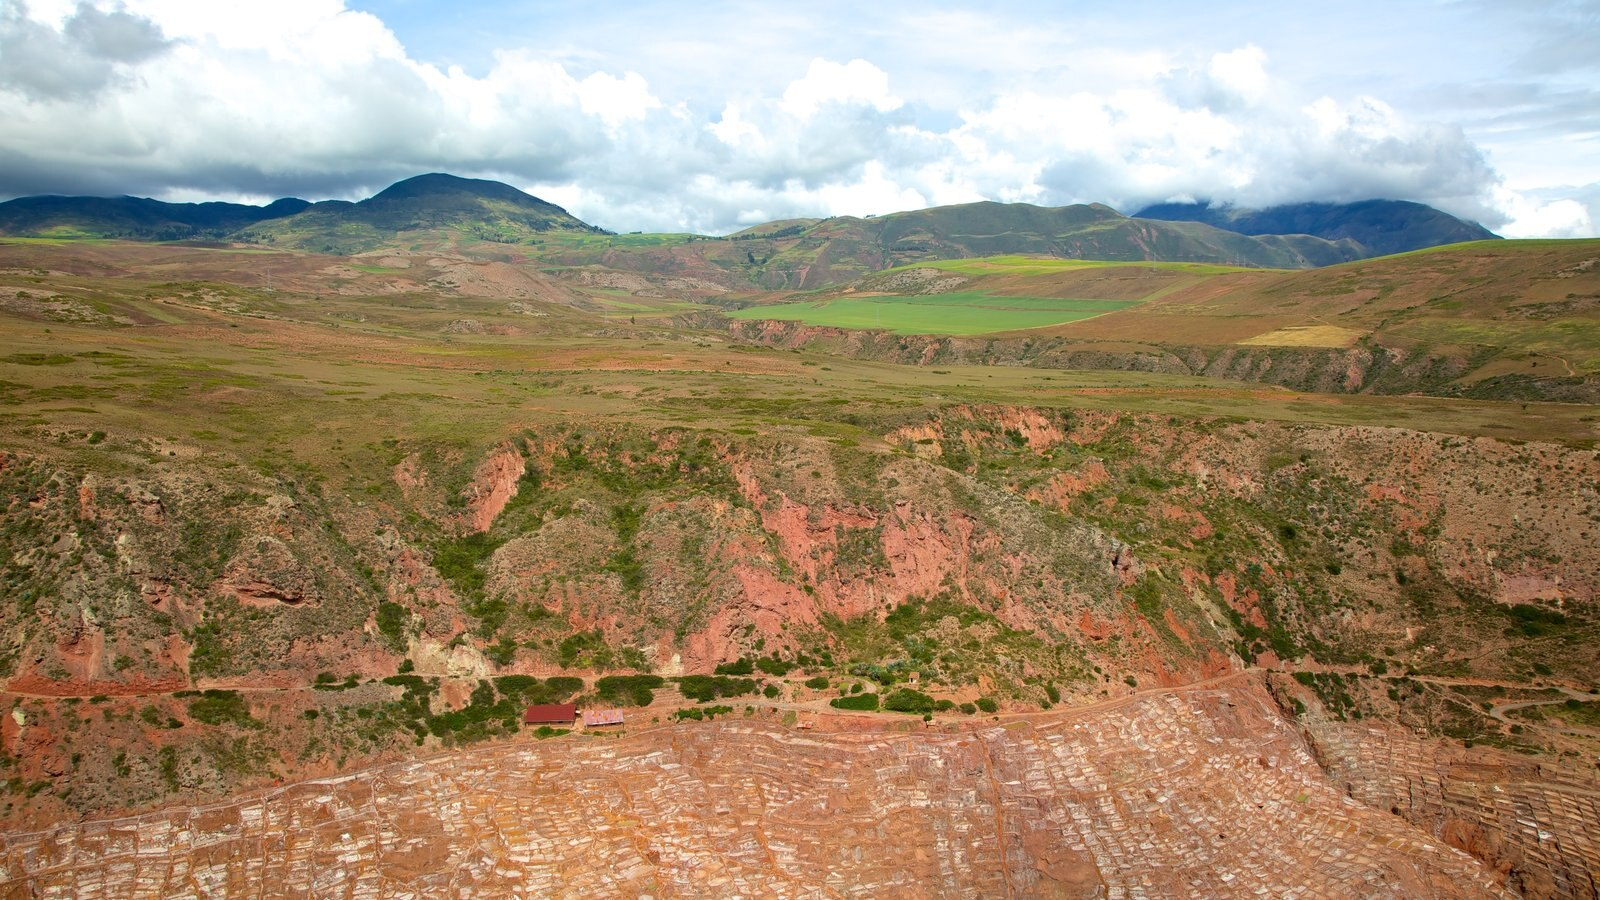 Salt Mines Of Maras featuring landscape views